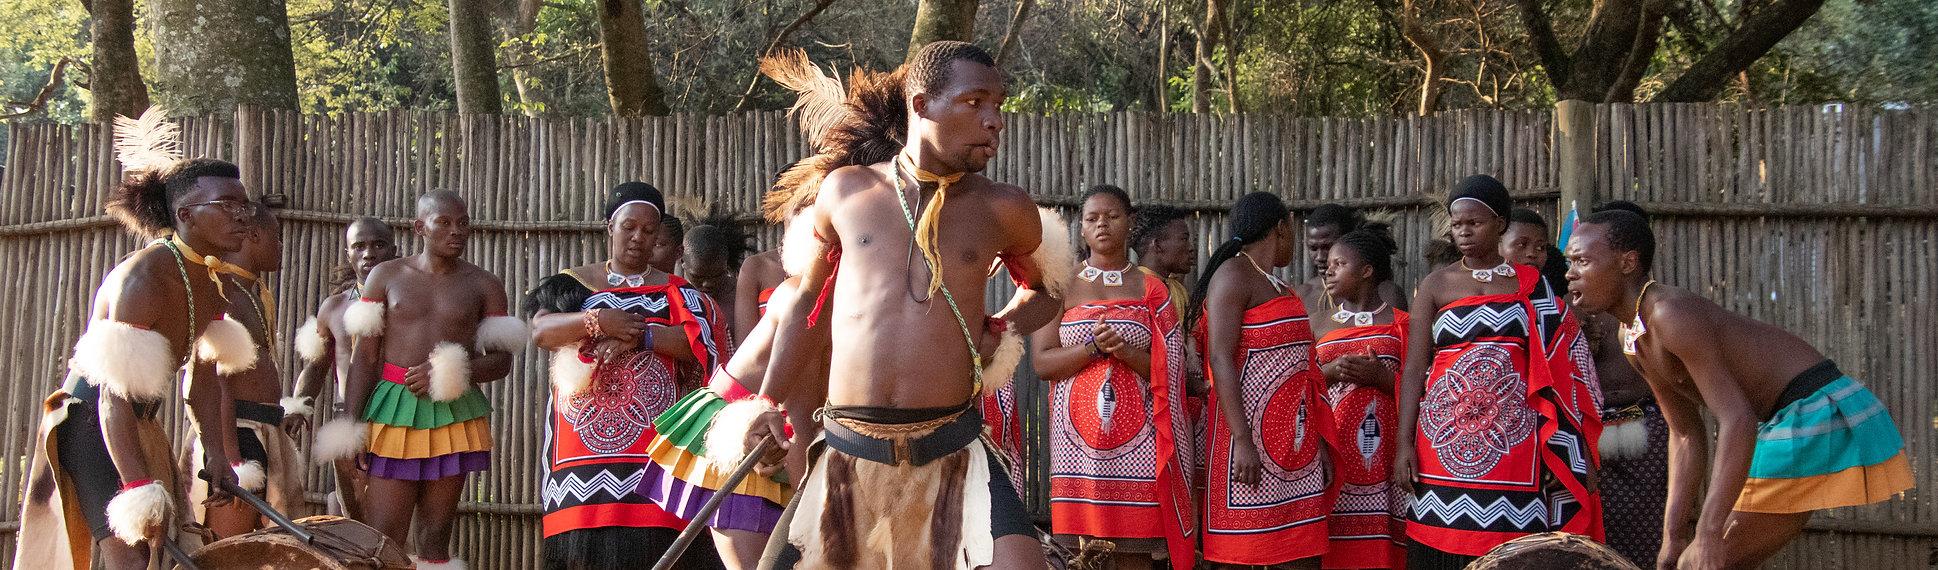 Eswatini_dancers_header.jpg